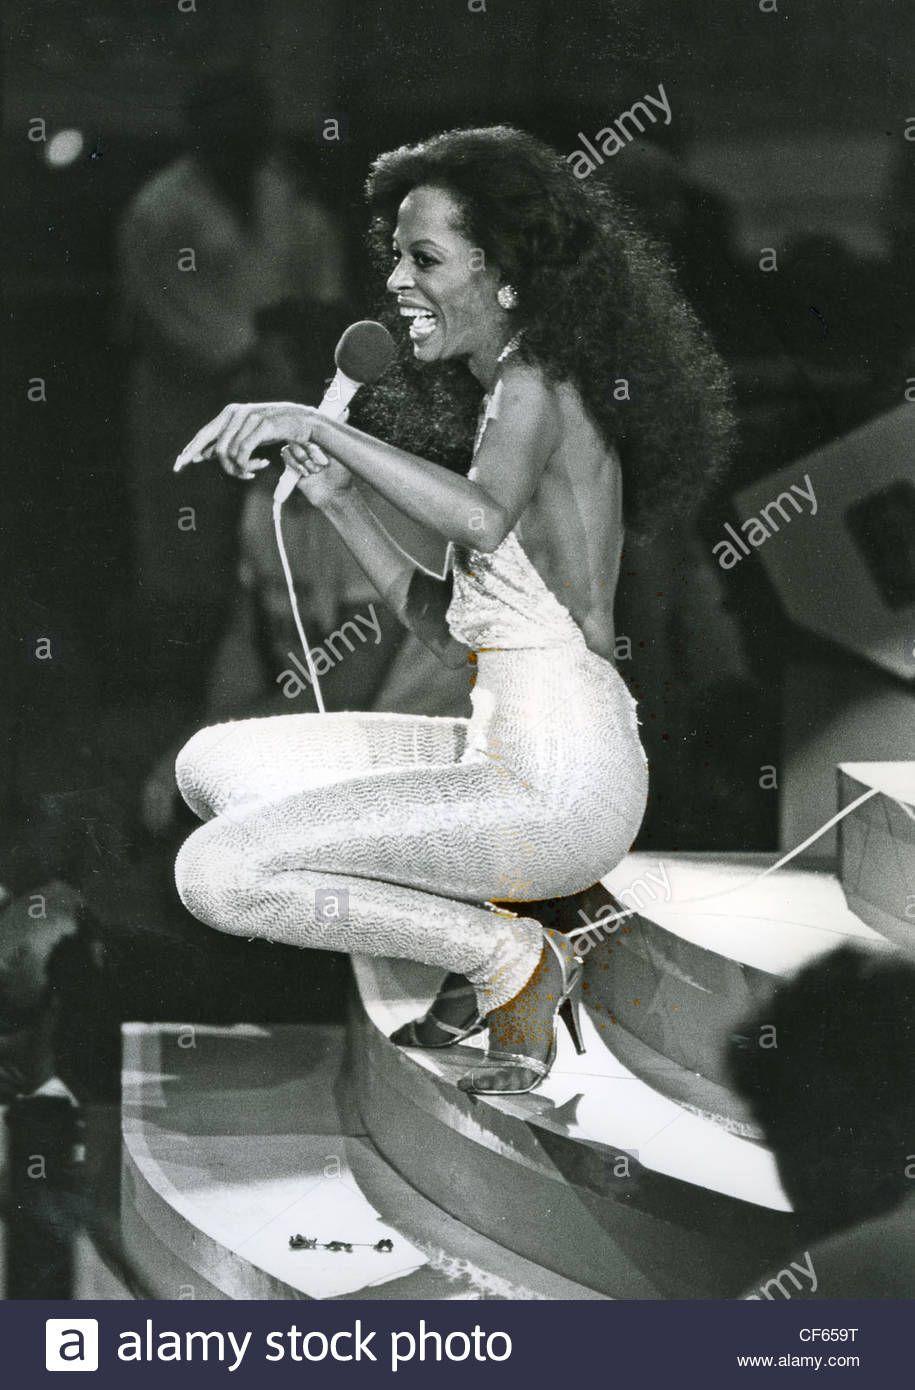 Diana Ross At The Ahoy, Rotterdam, In 1982. Photo Rob